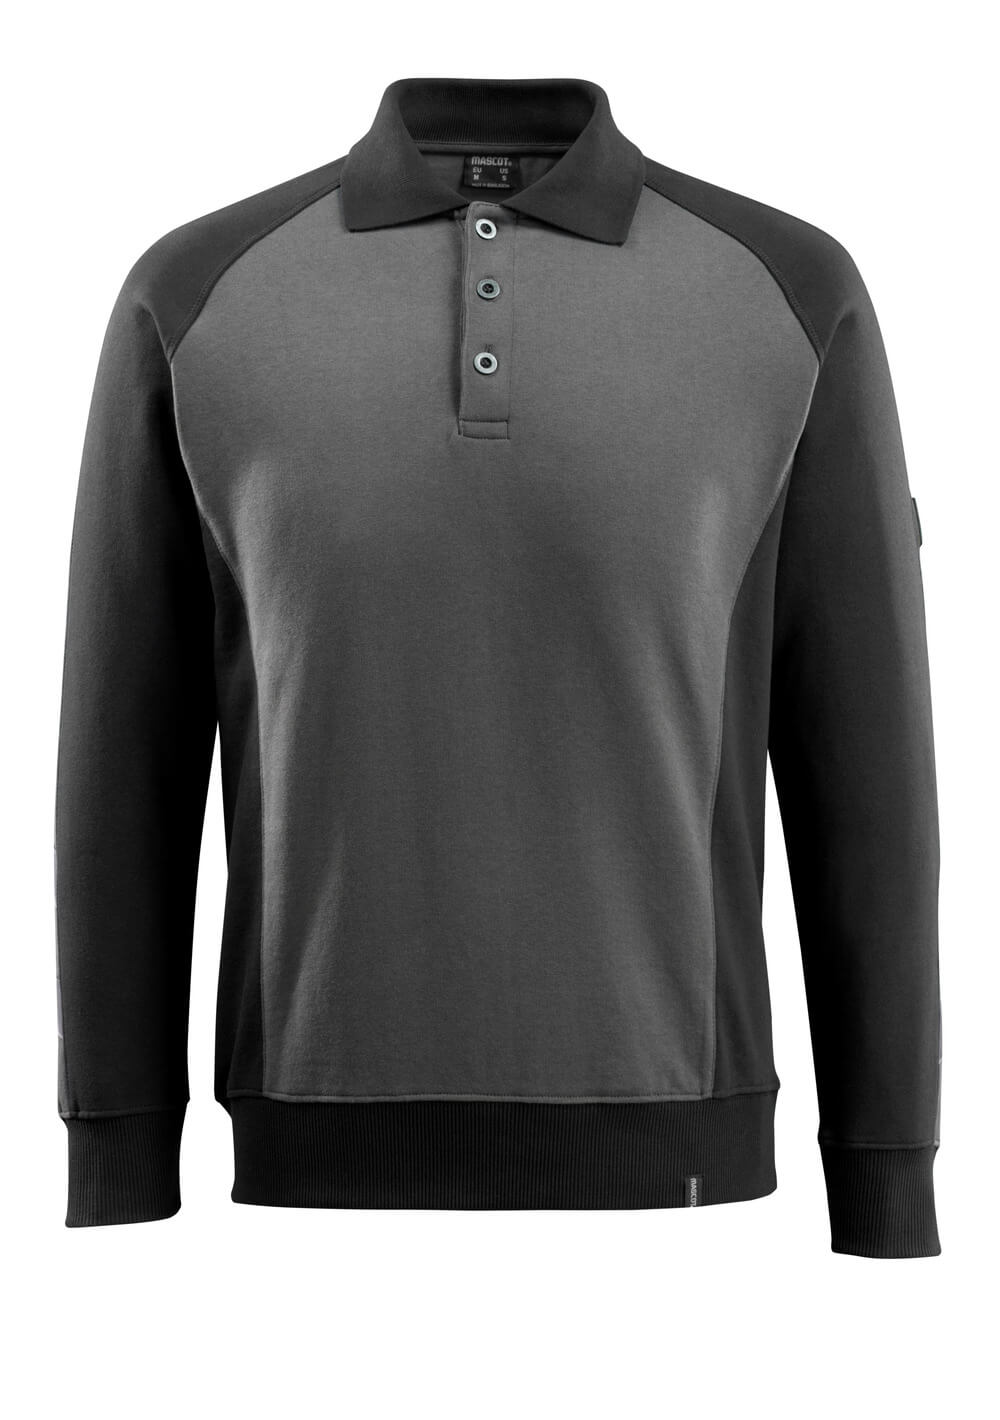 50610-962-1809 Polosweatshirt - mørk antracit/sort